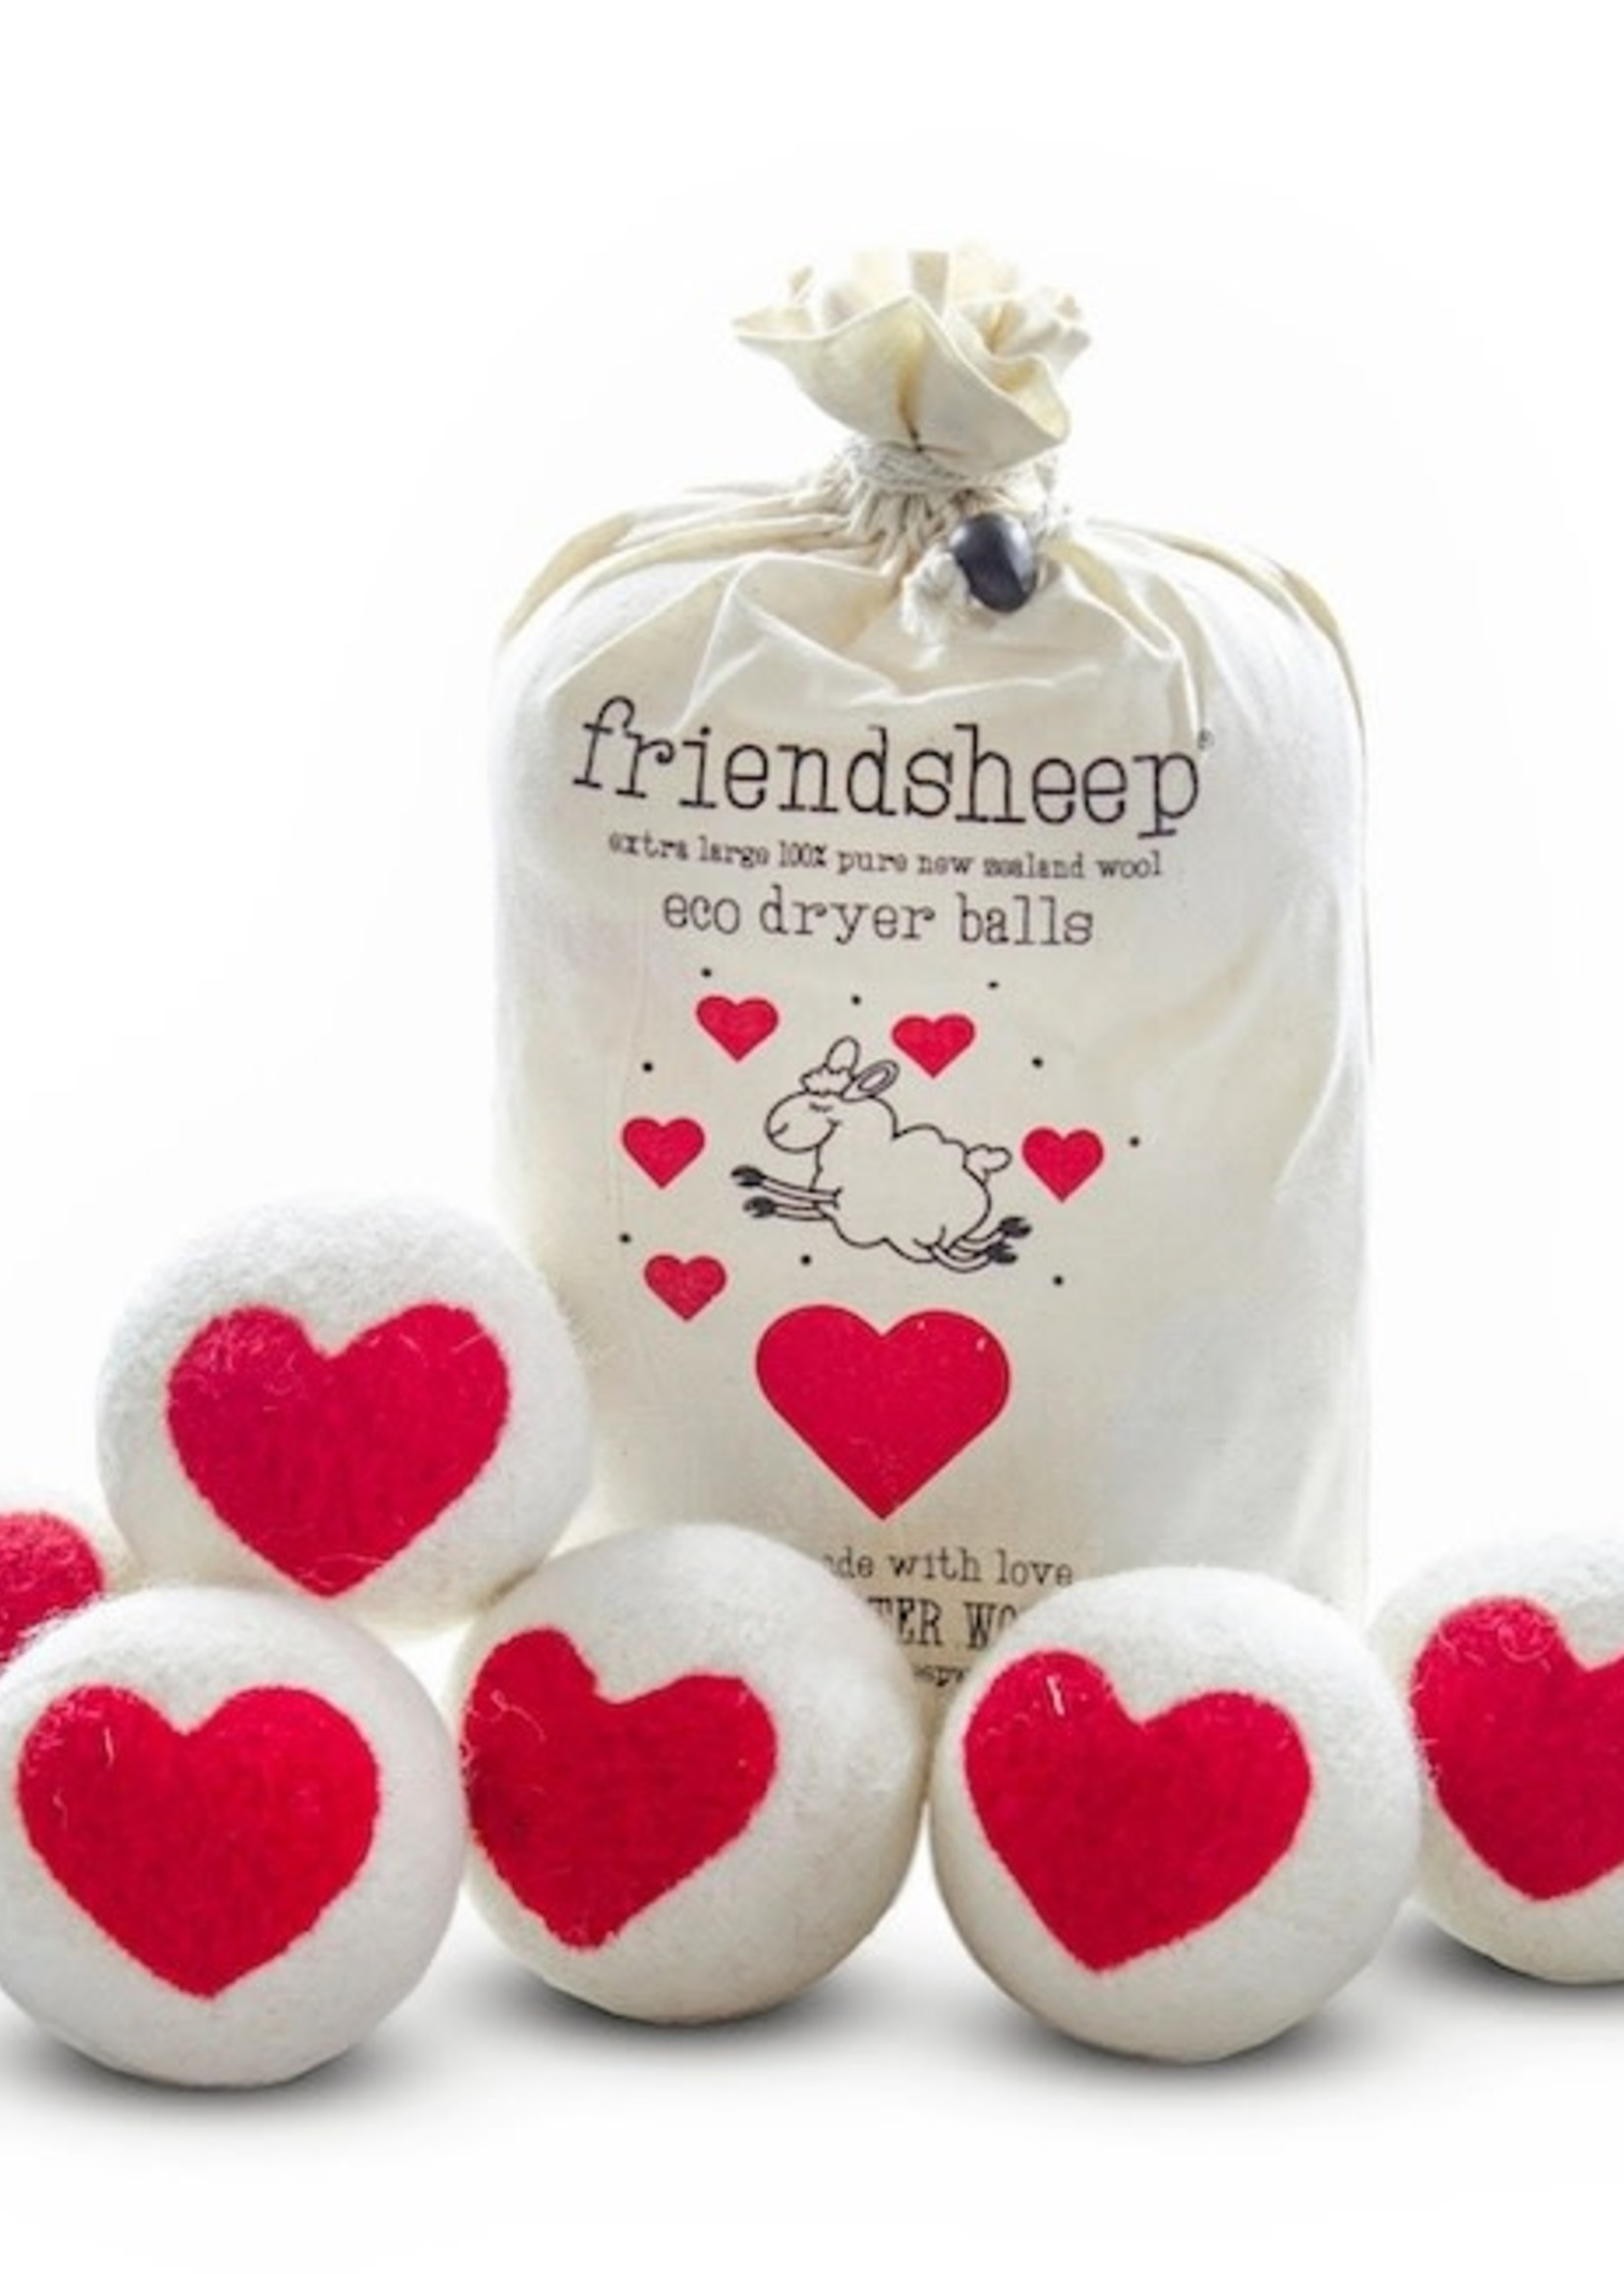 Friendsheep One Heart Dryer Balls